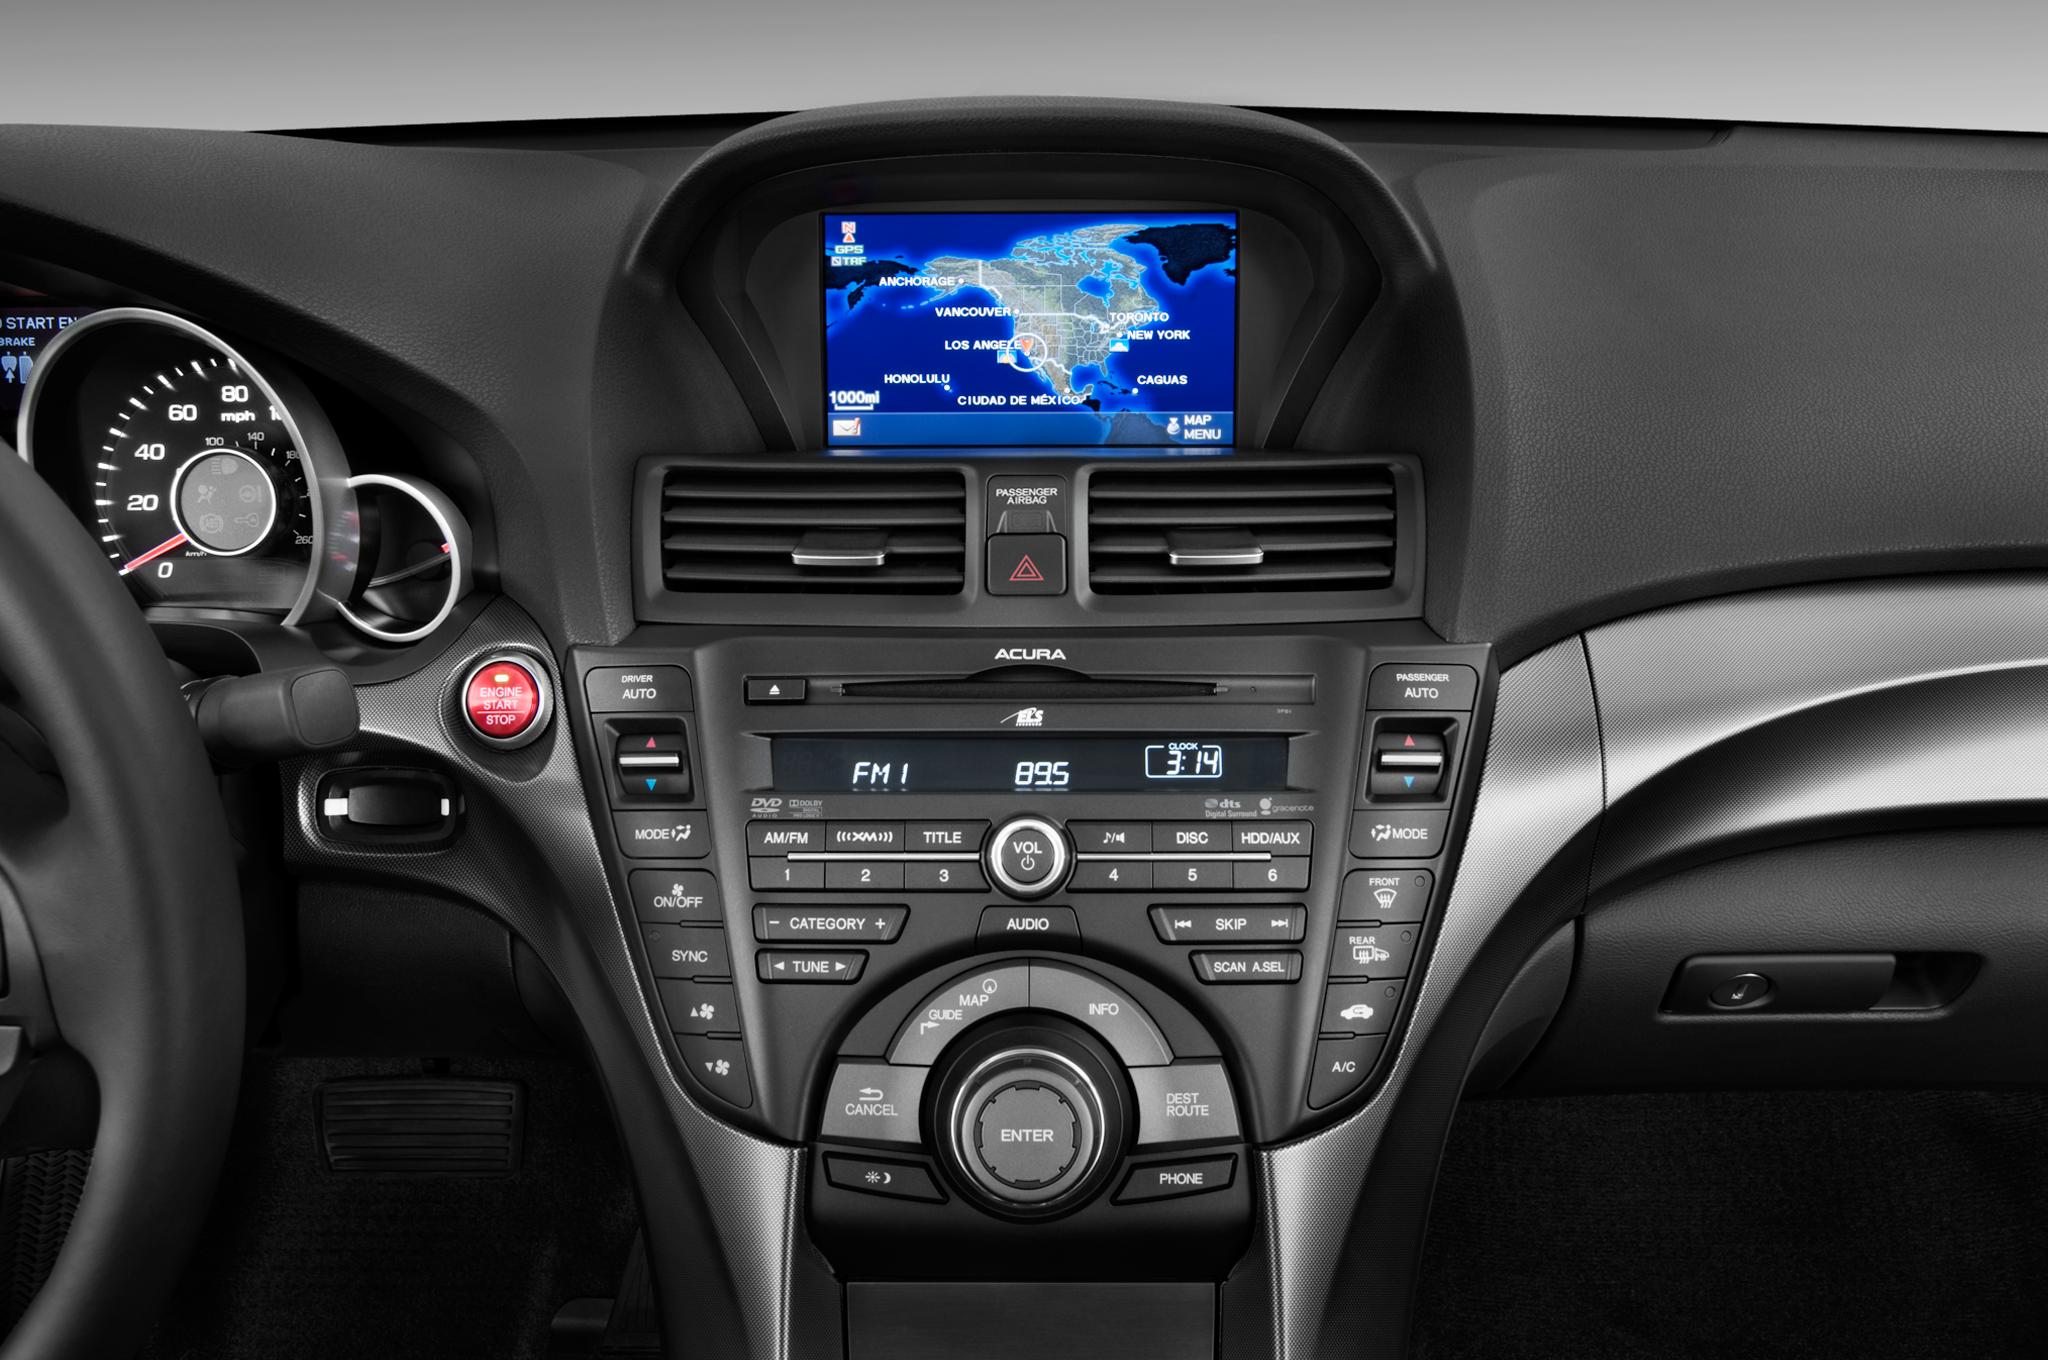 2012 Acura Tl Sh Awd Advance Editors Notebook | 2017-2018 Car Release Date